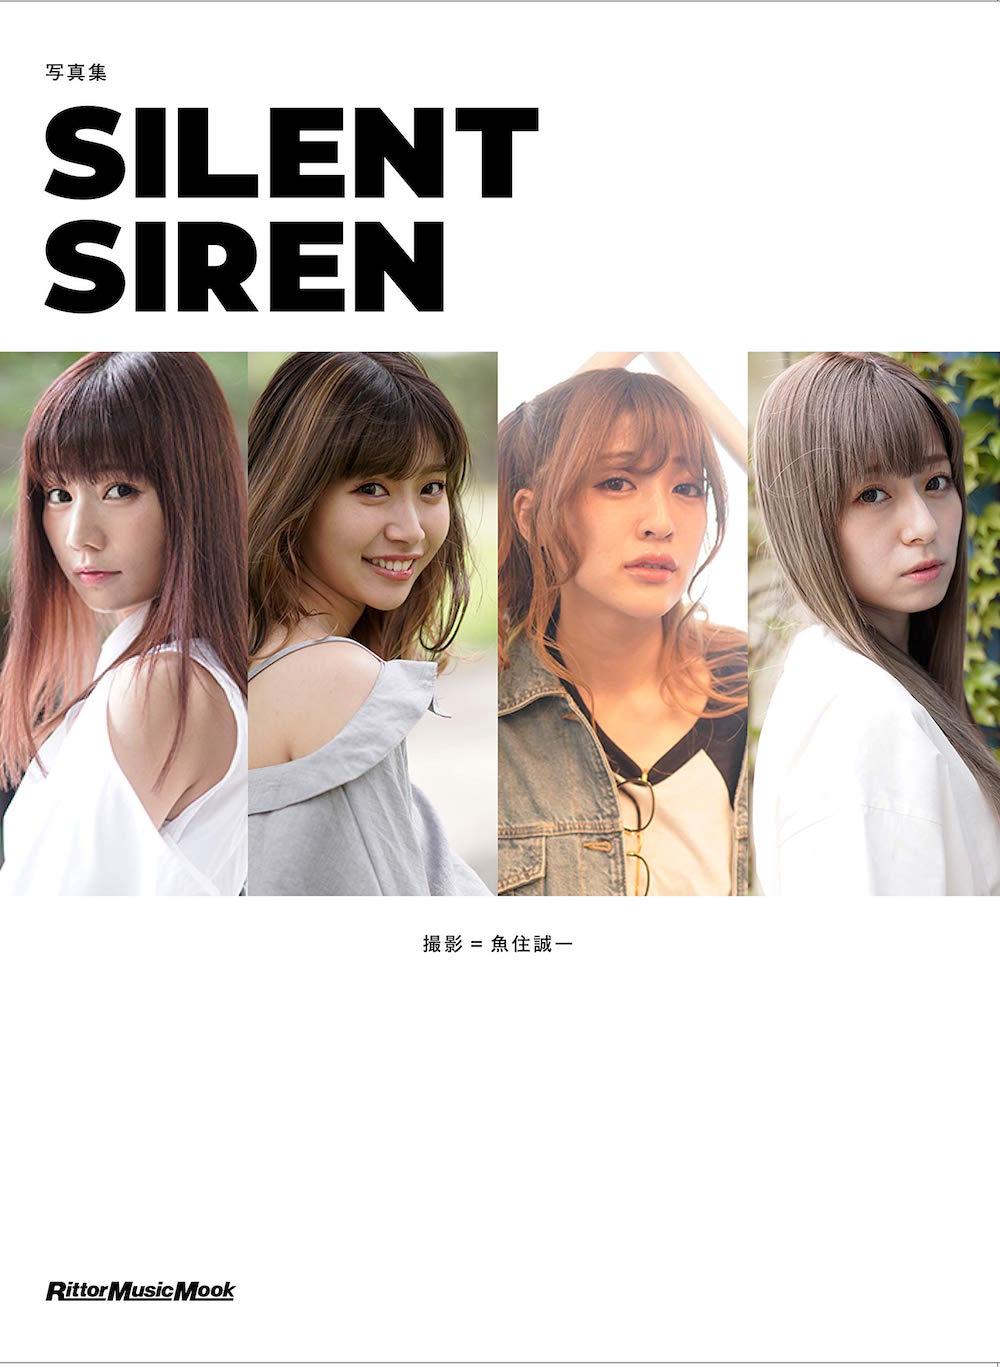 SILENT SIRENのオフショットと、バンドとして躍動し続けるライブシーンを追いかけた、初の公式写真集(撮影:魚住誠一)